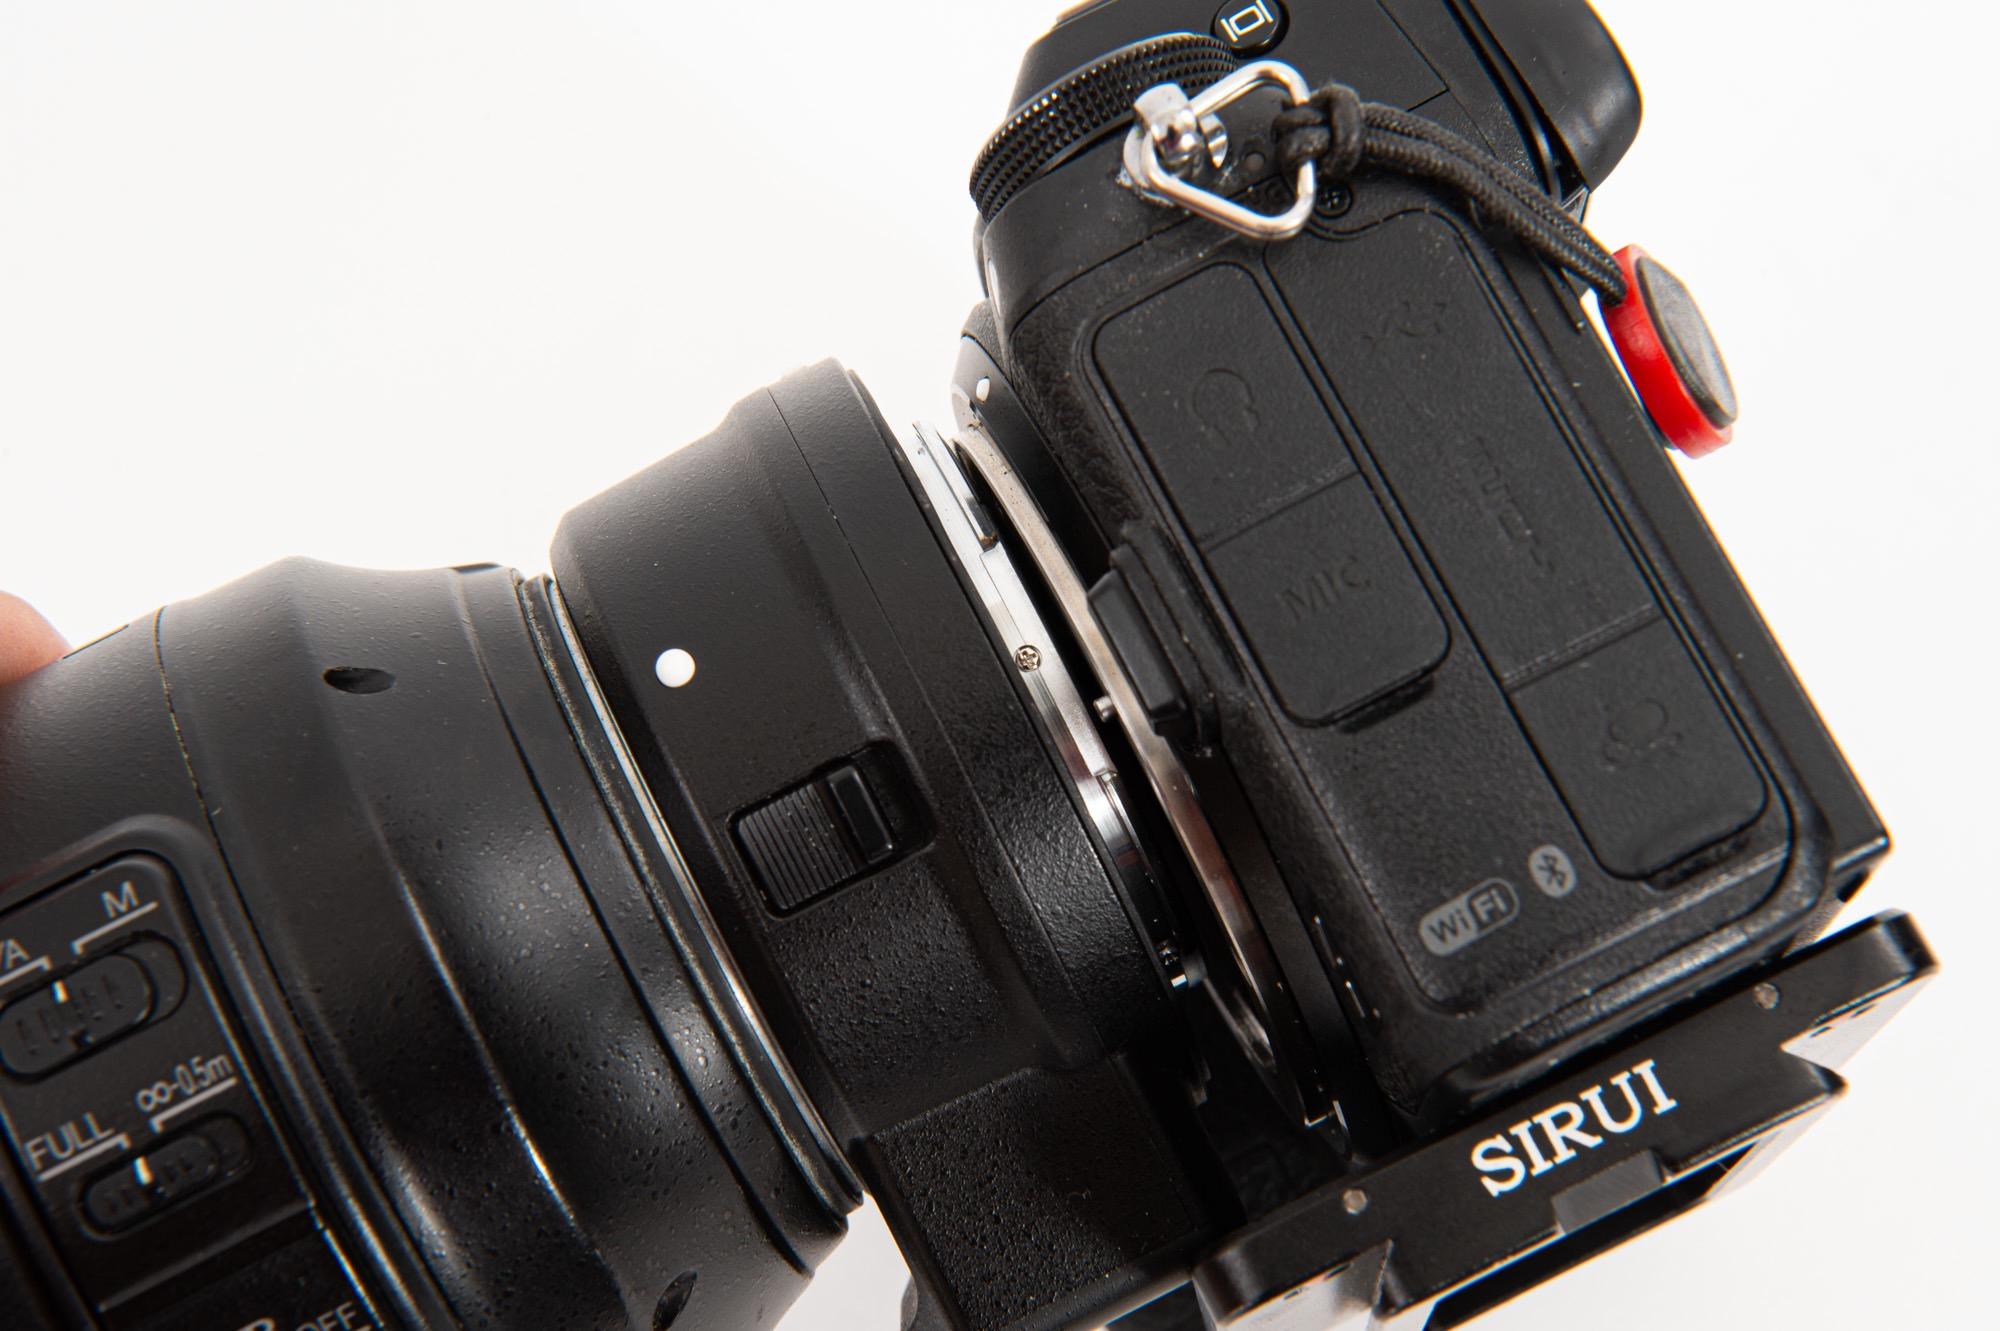 Nikon ZのクイックシューとFTZの干渉